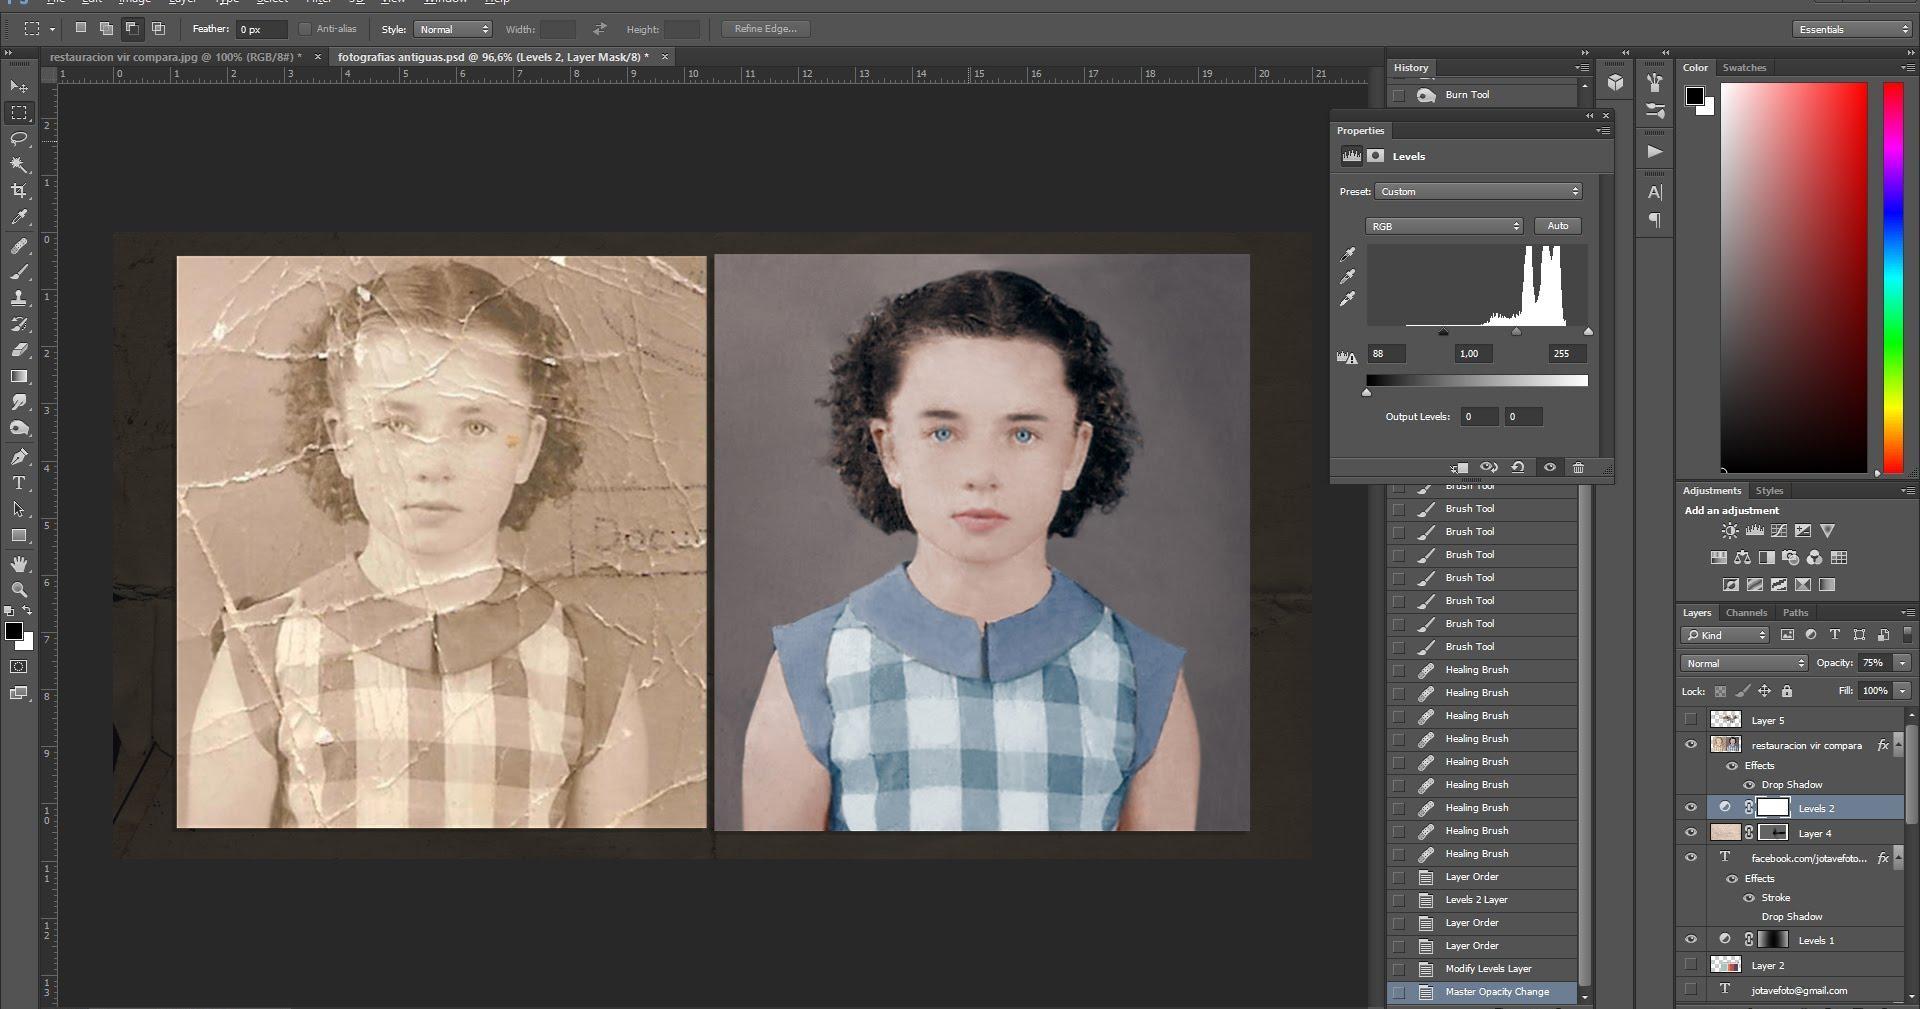 No te pierdas esta restauración fotográfica, ¡parece magia!